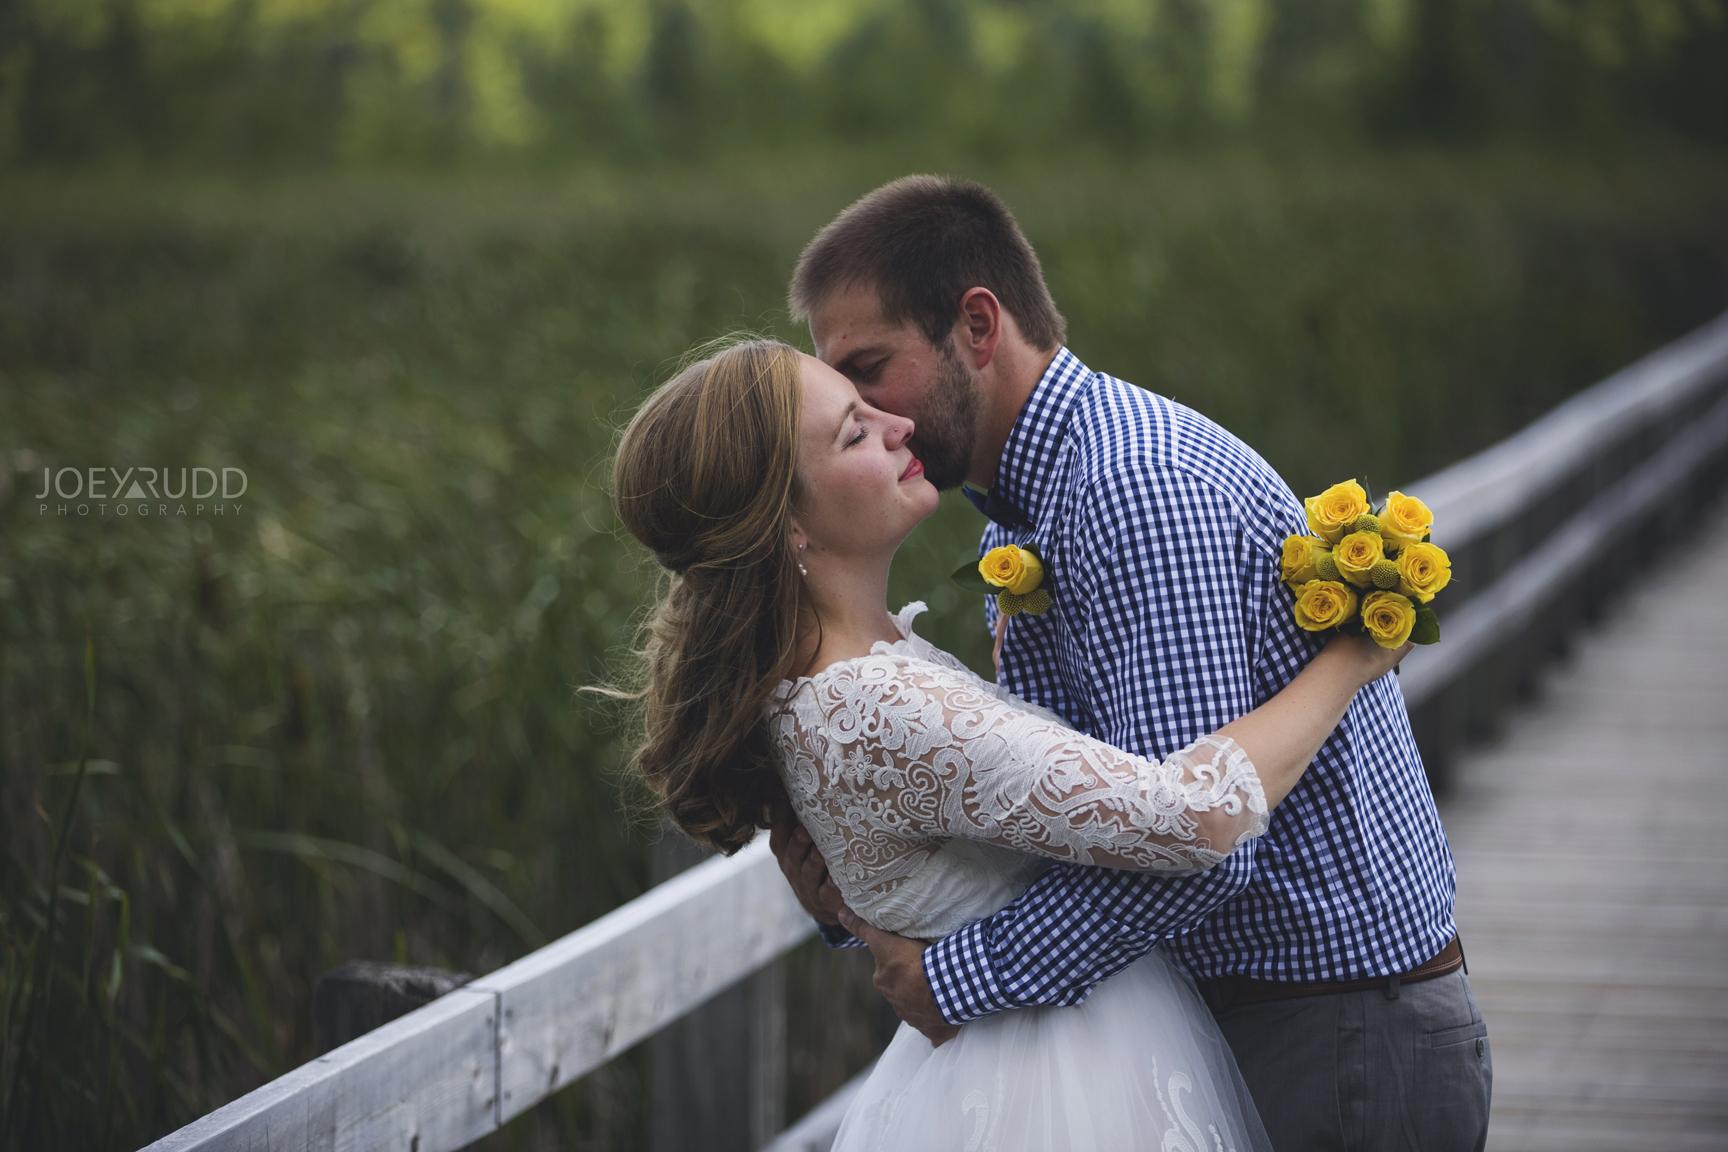 Ottawa Elopement by Joey Rudd Photography Ottawa Wedding Photographer Mer Bleue Ottawa Wedding Chapel Grass Nature